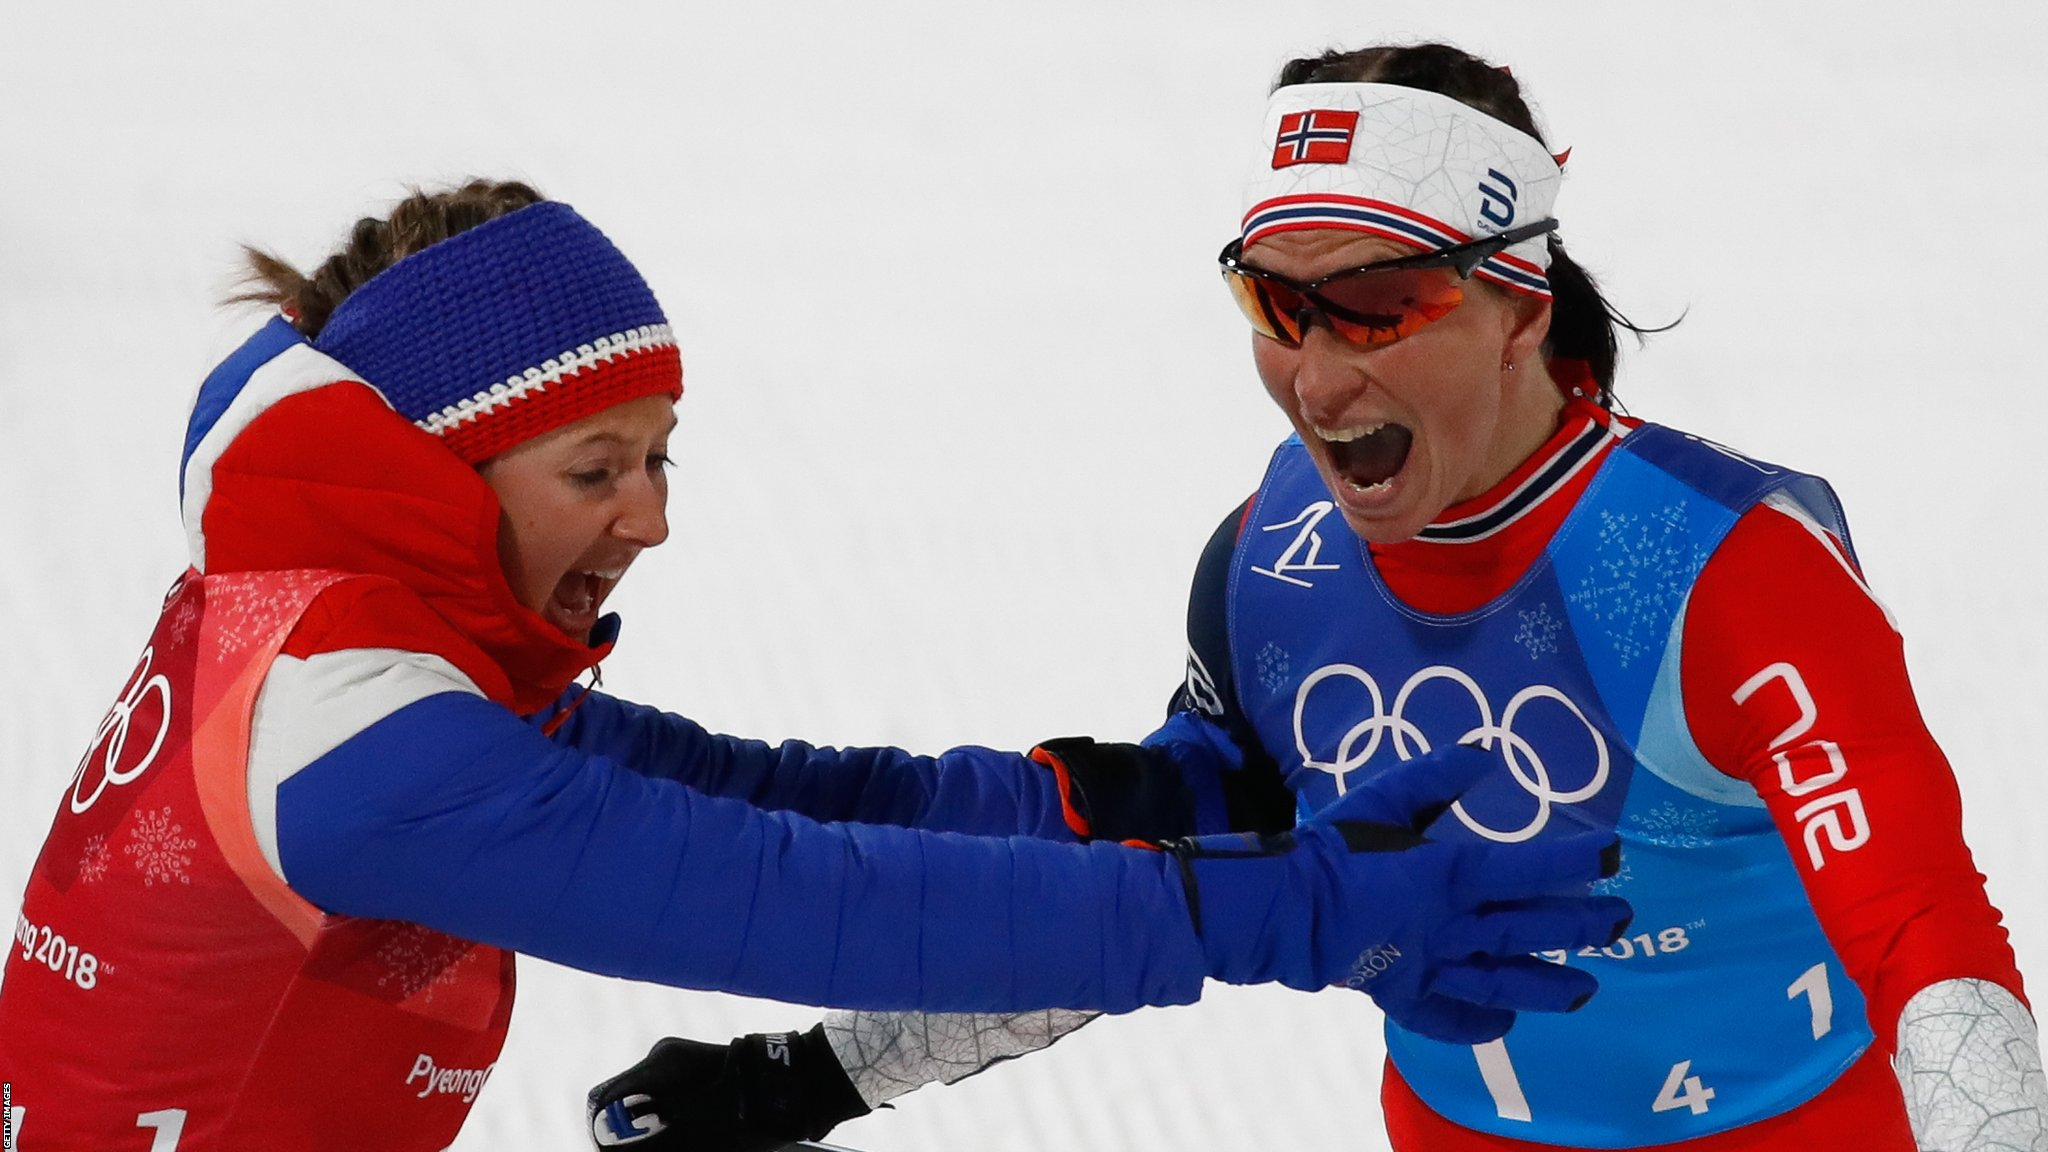 Winter Olympics: Marit Bjorgen ties medal record as Norway win women's 4x5km relay